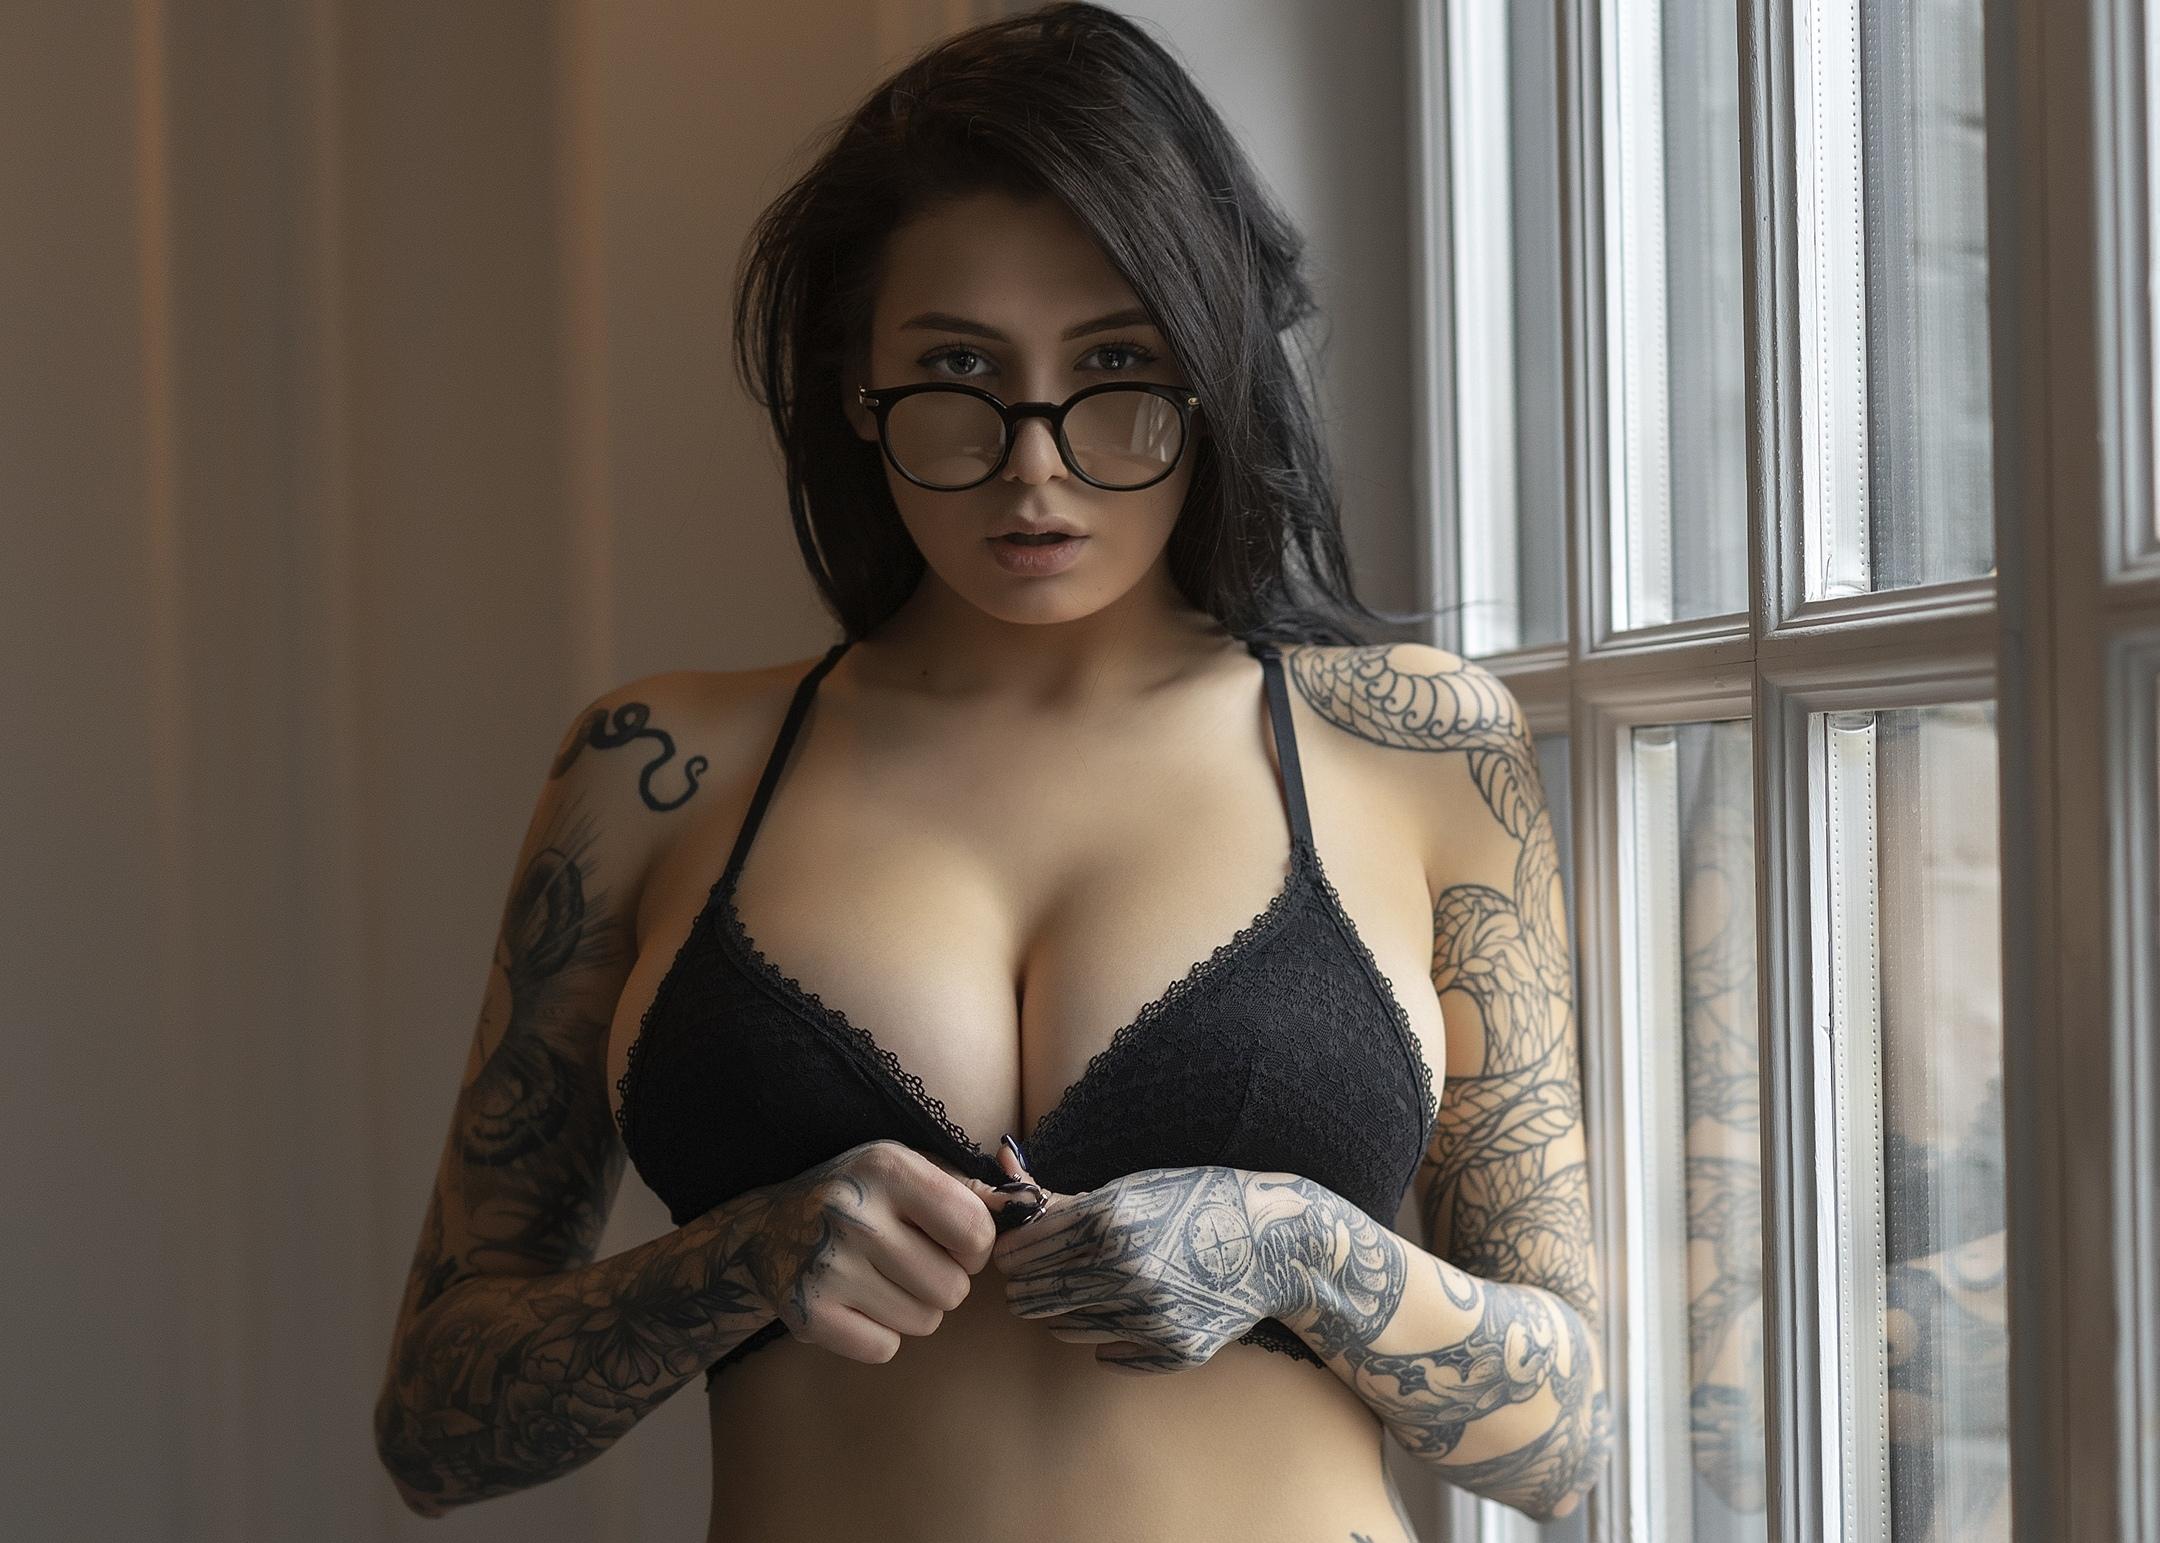 Evgenia Talanina nudes (43 photo), hot Sideboobs, Twitter, underwear 2018